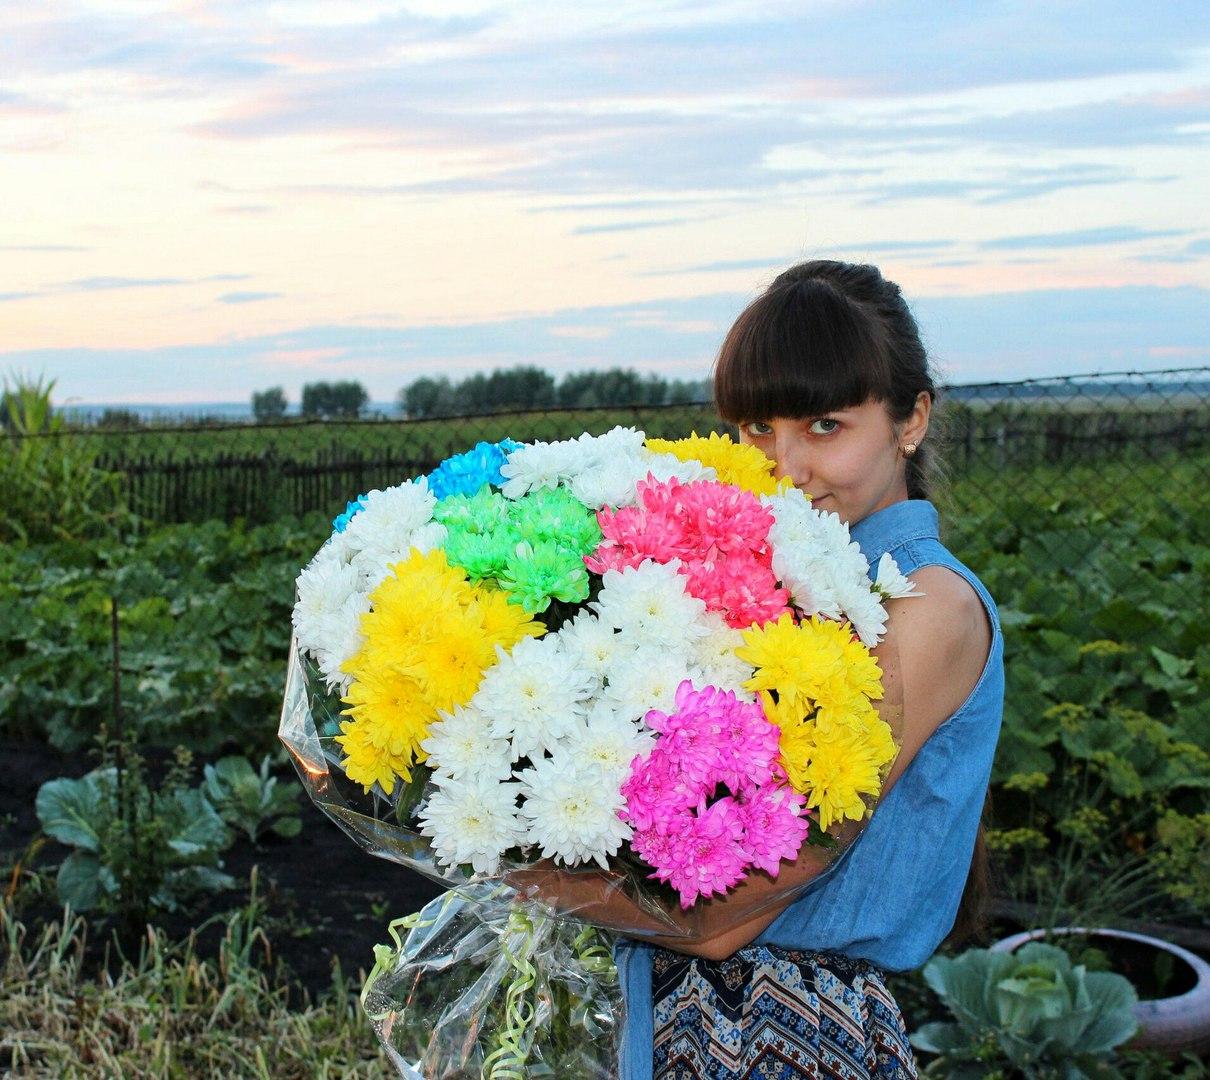 Анастасия Шуринова, Стерлитамак - фото №2